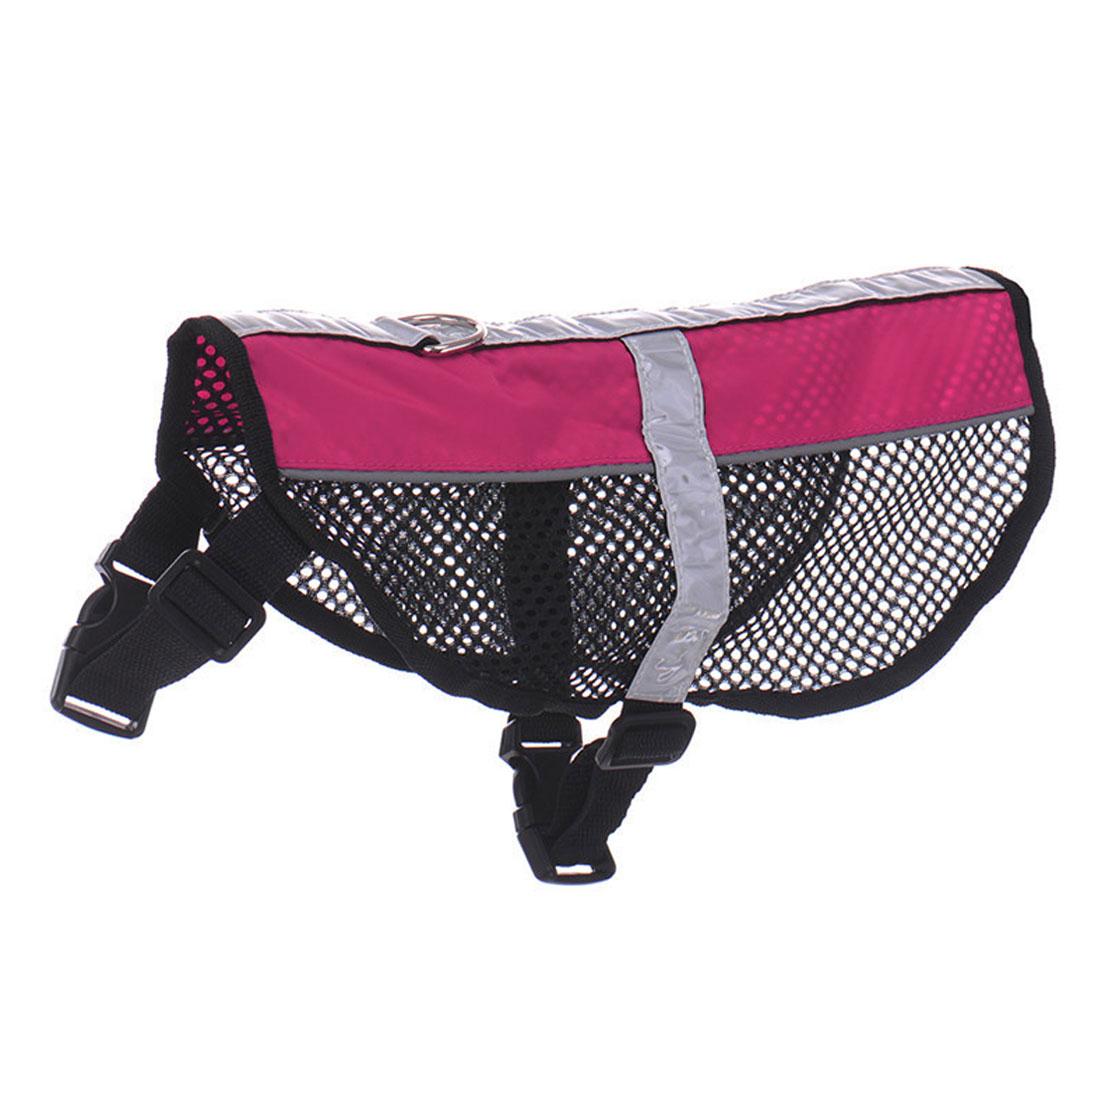 Service Dog Mesh Vest Harness Cool Comfort Nylon High Visibility Safety Jacket Pink L